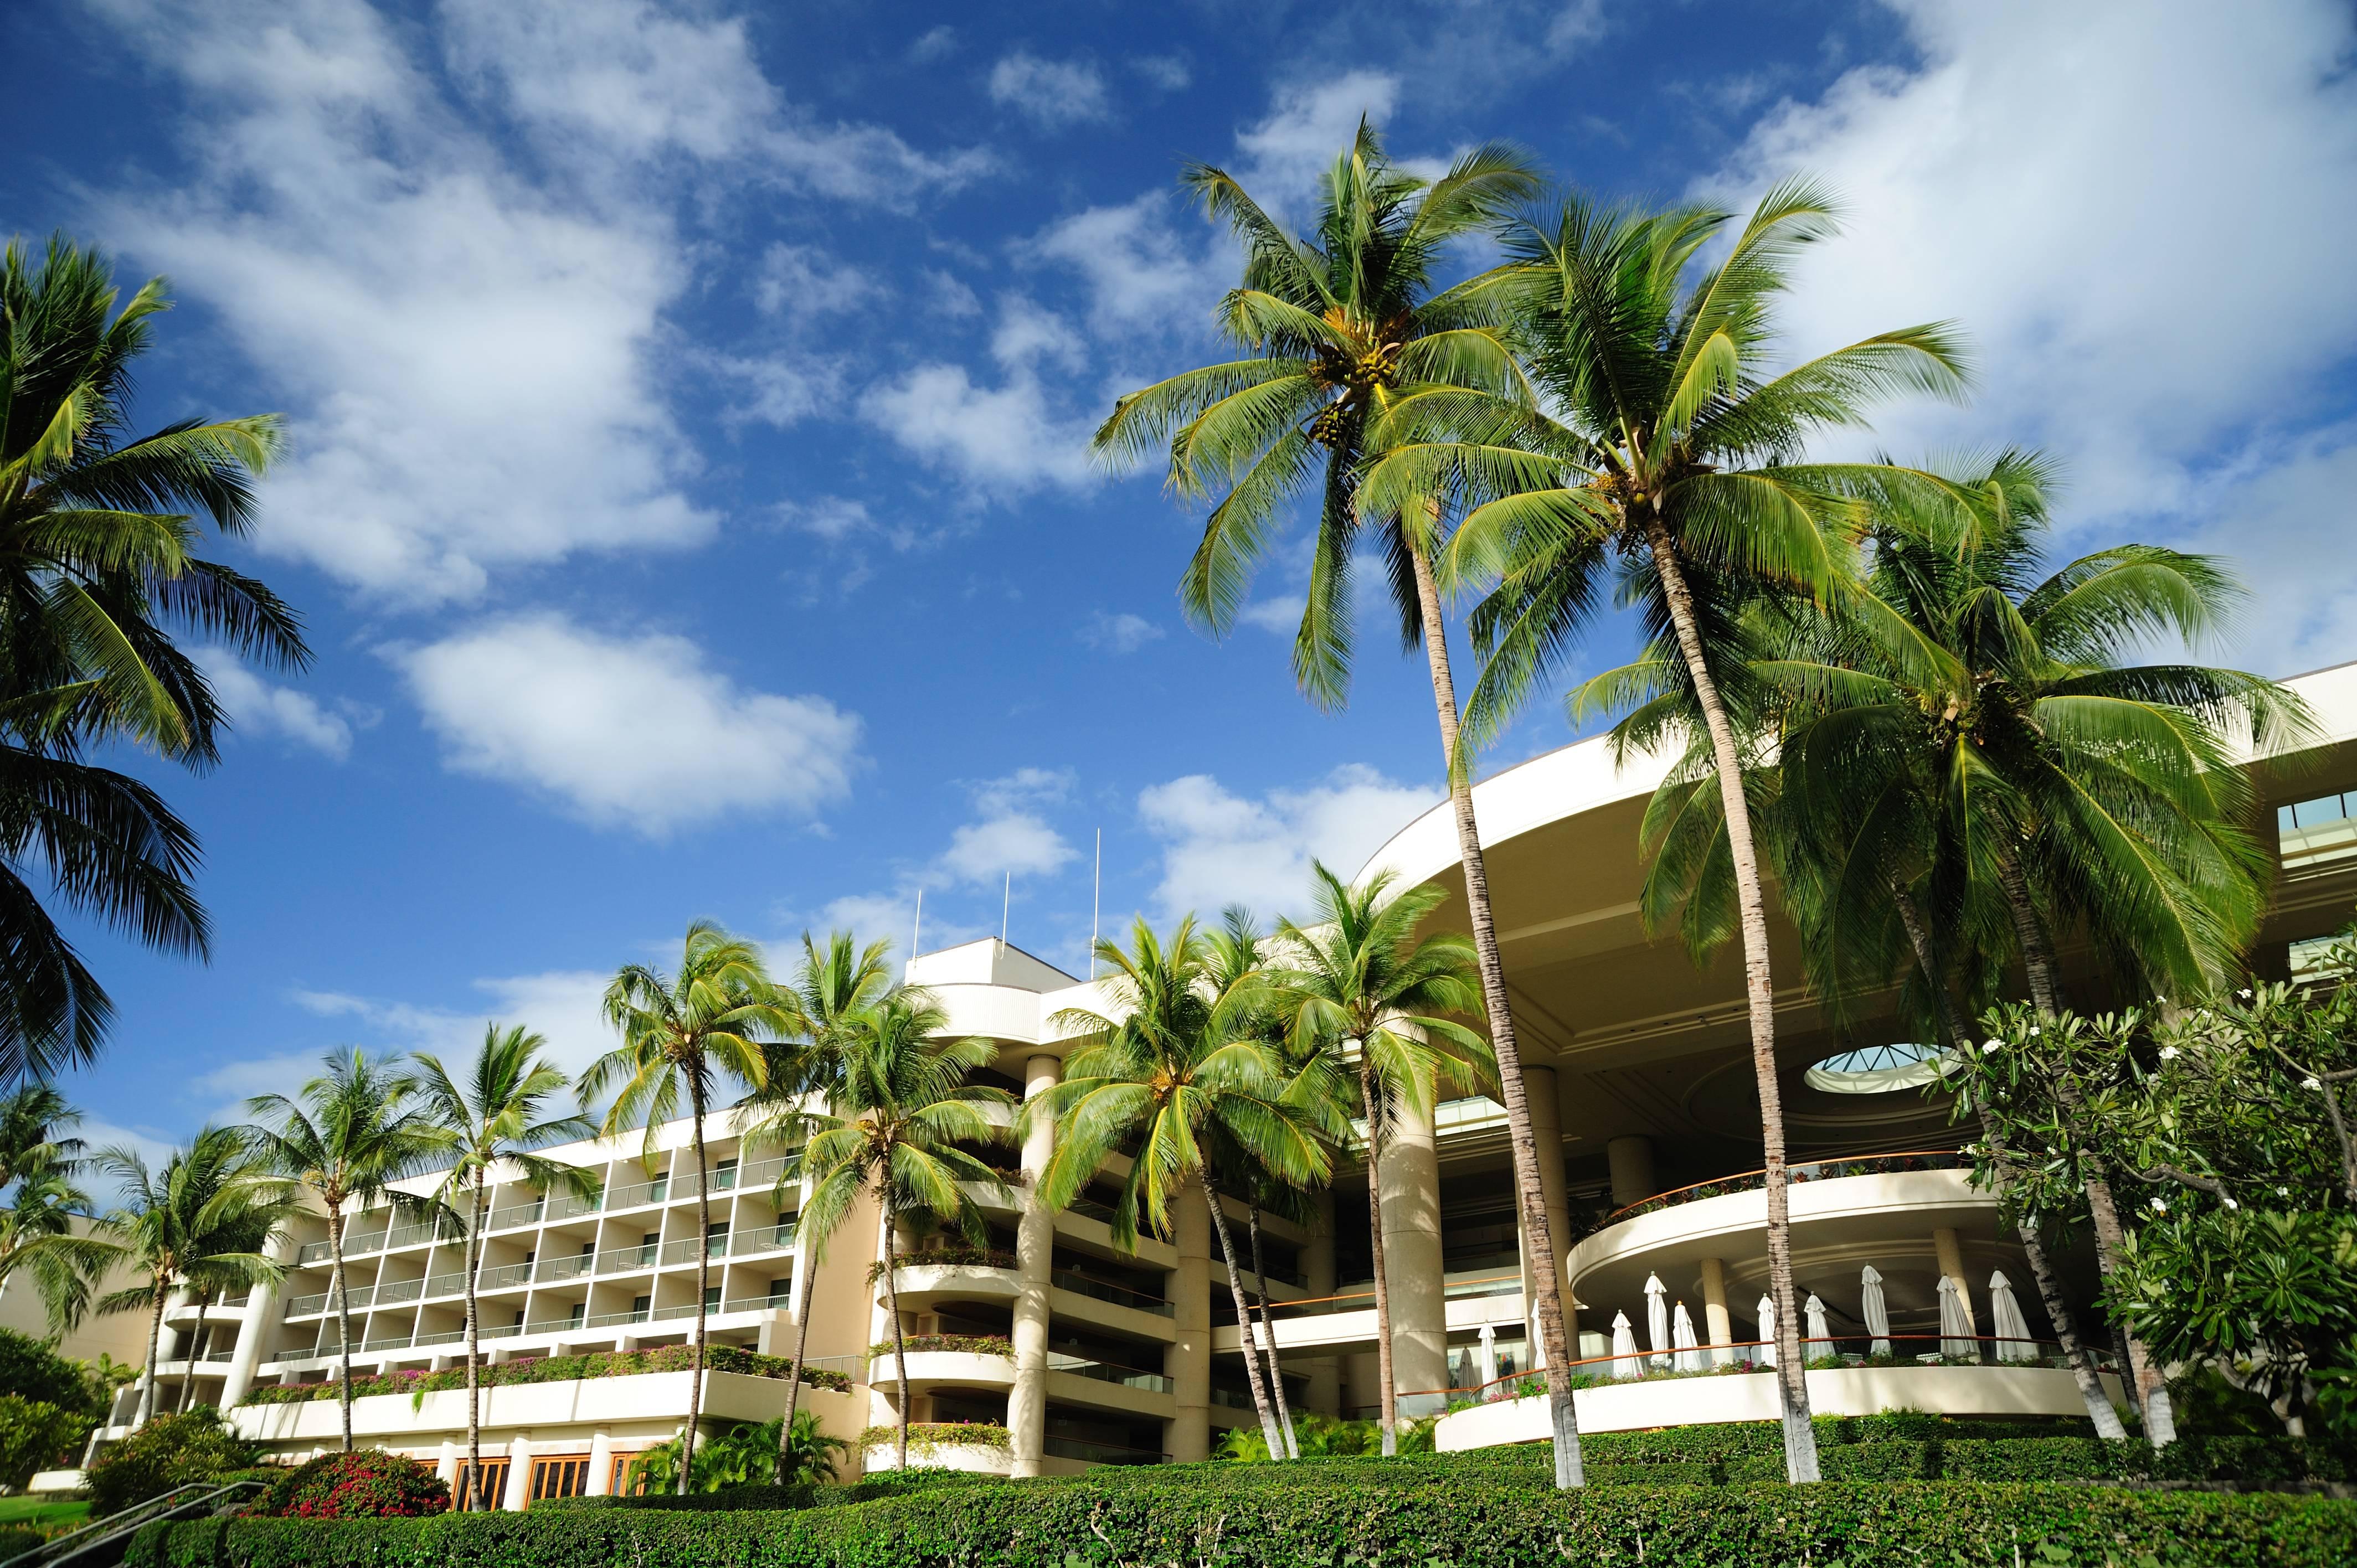 Hapuna-Beach-Prince-Hotel.jpg (4256×2832)